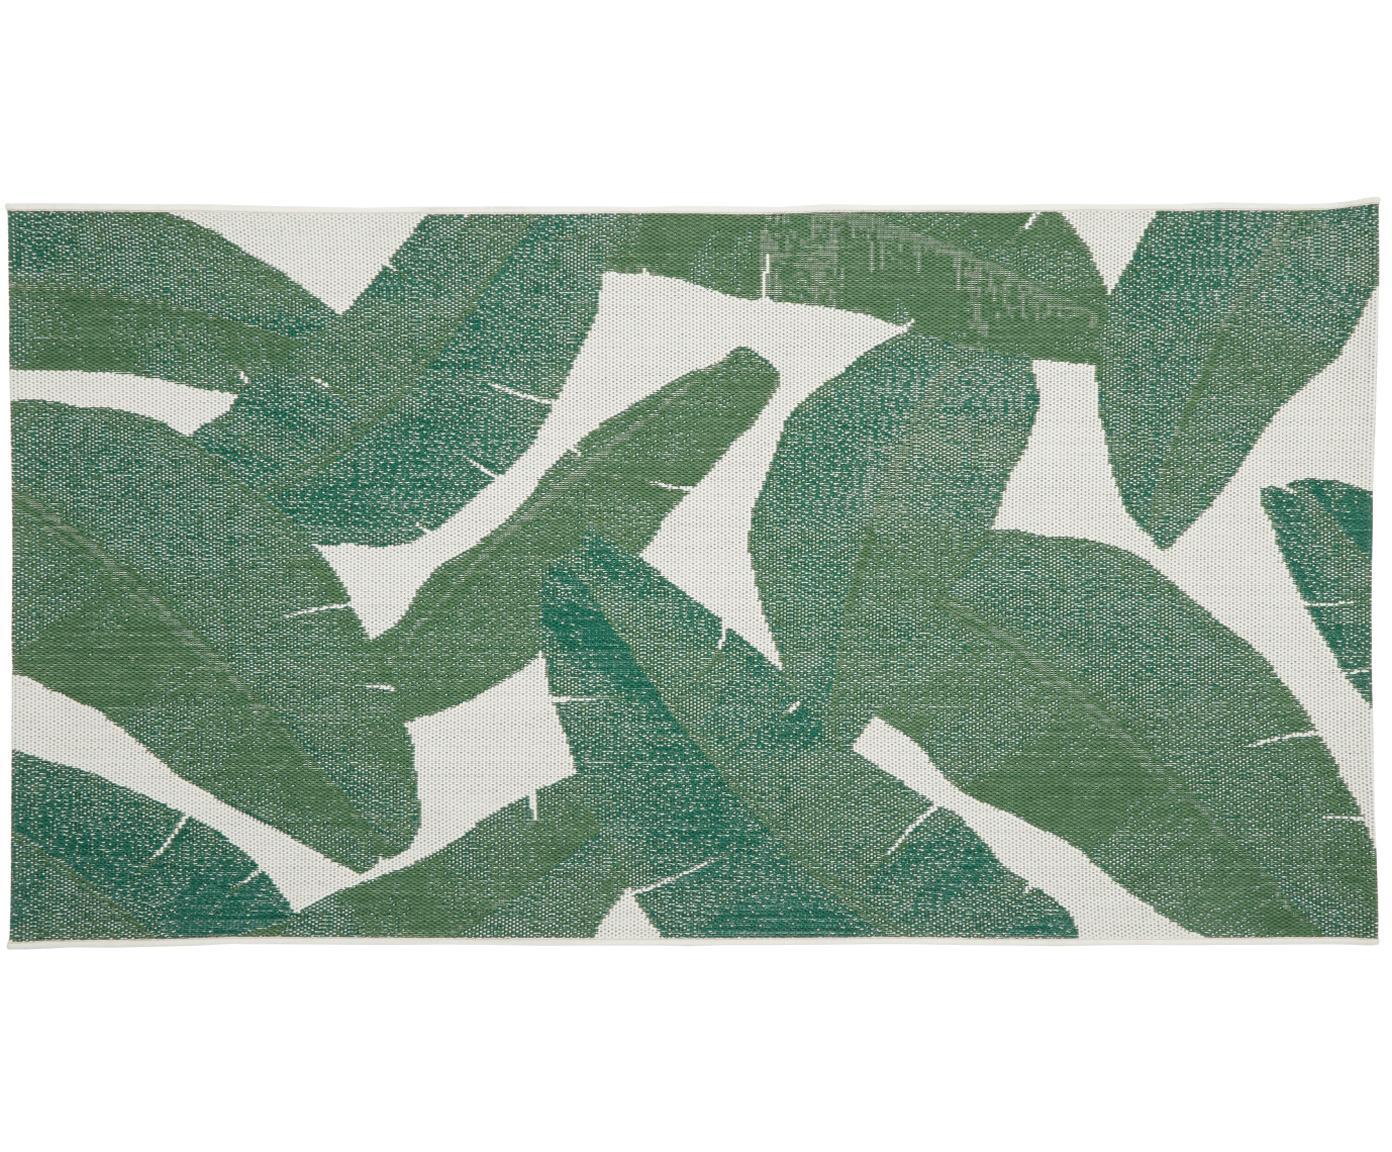 Alfombra de interior/exterior Jungle, Parte superior: polipropileno, Reverso: poliéster, Blanco, verde, An 80 x L 150 cm (Tamaño XS)